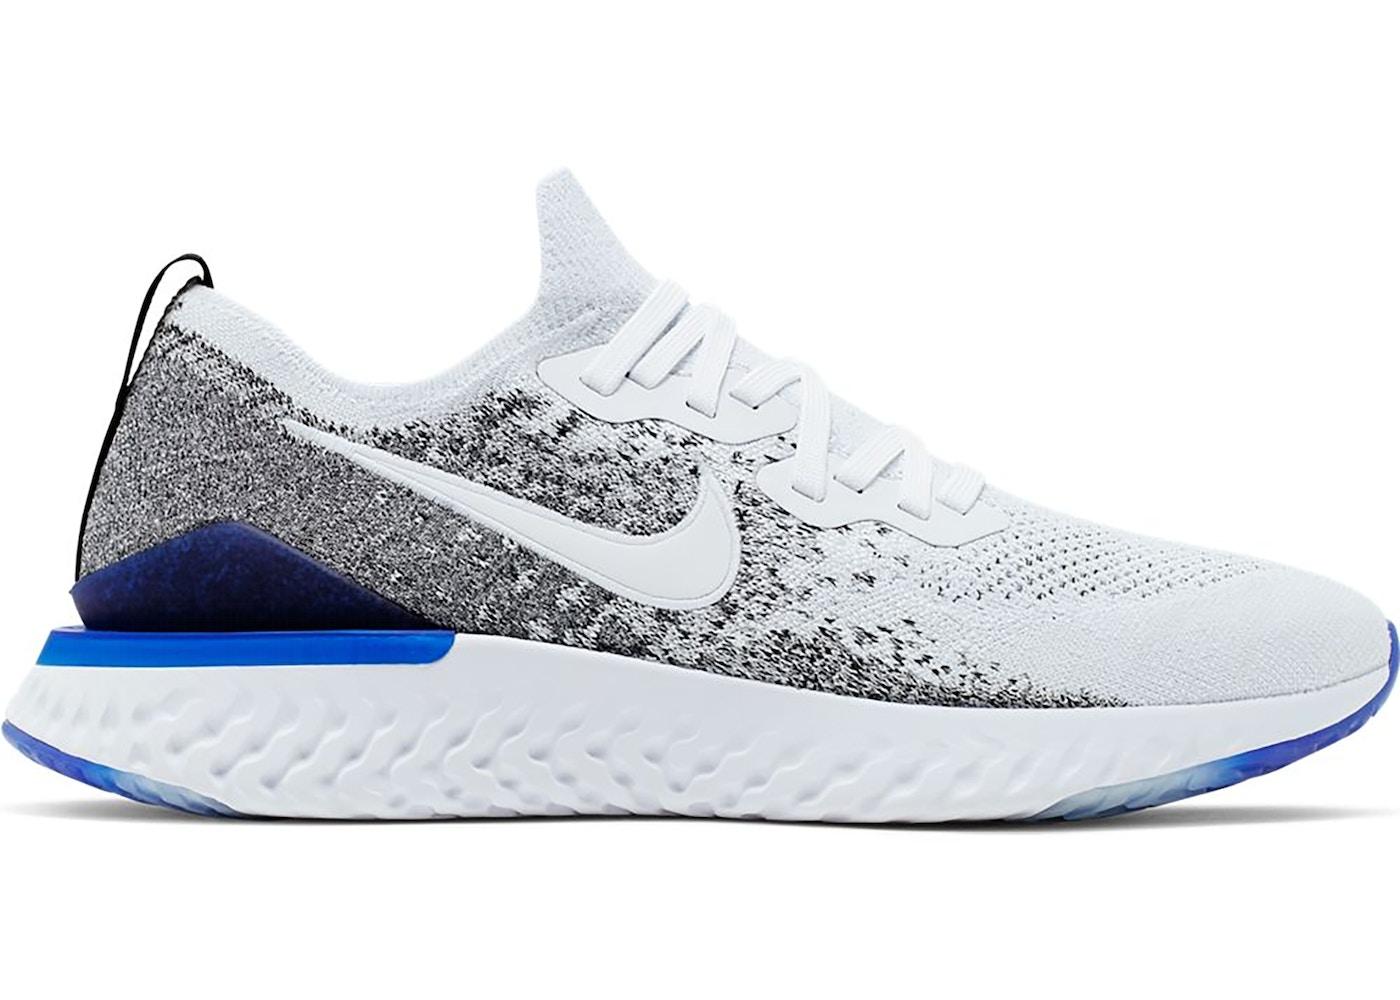 Nike Epic React Flyknit 2 White Black Racer Blue